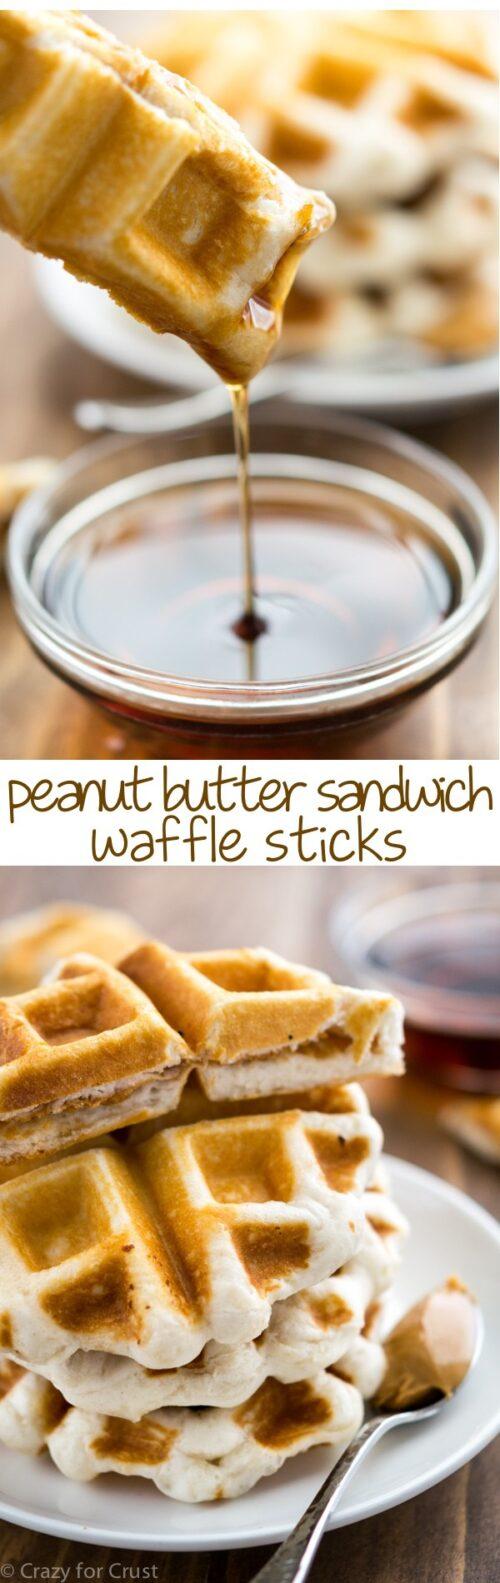 peanut butter sandwich waffles collage photos